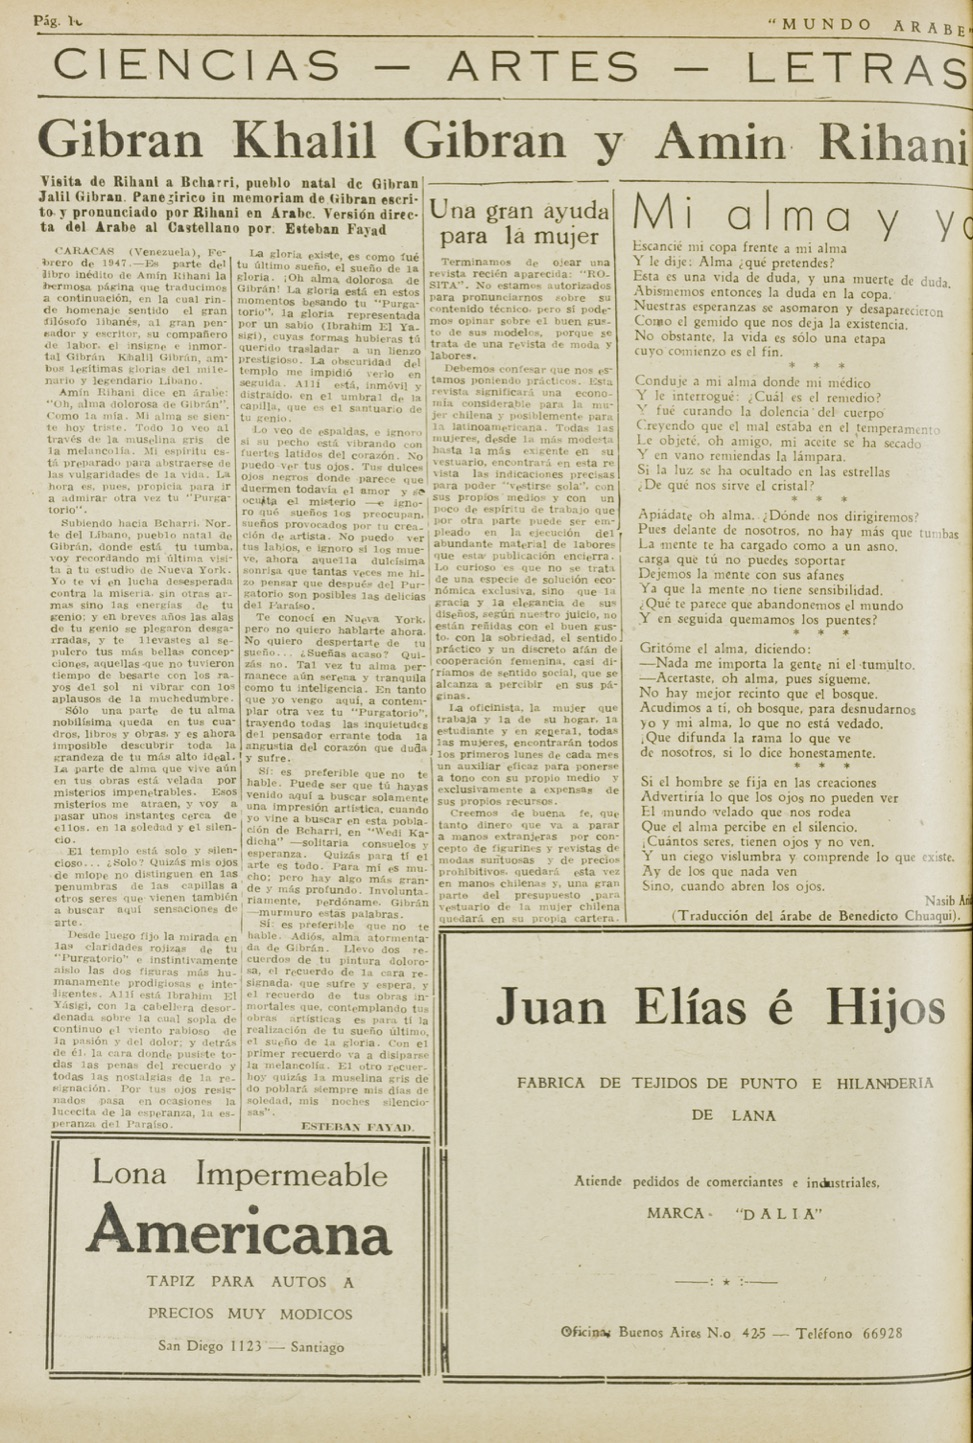 "Esteban Fayad, ""Gibran Khalil Gibran y Amin Rihani"", Mundo Árabe, Jun 30, 1947, p. 10."